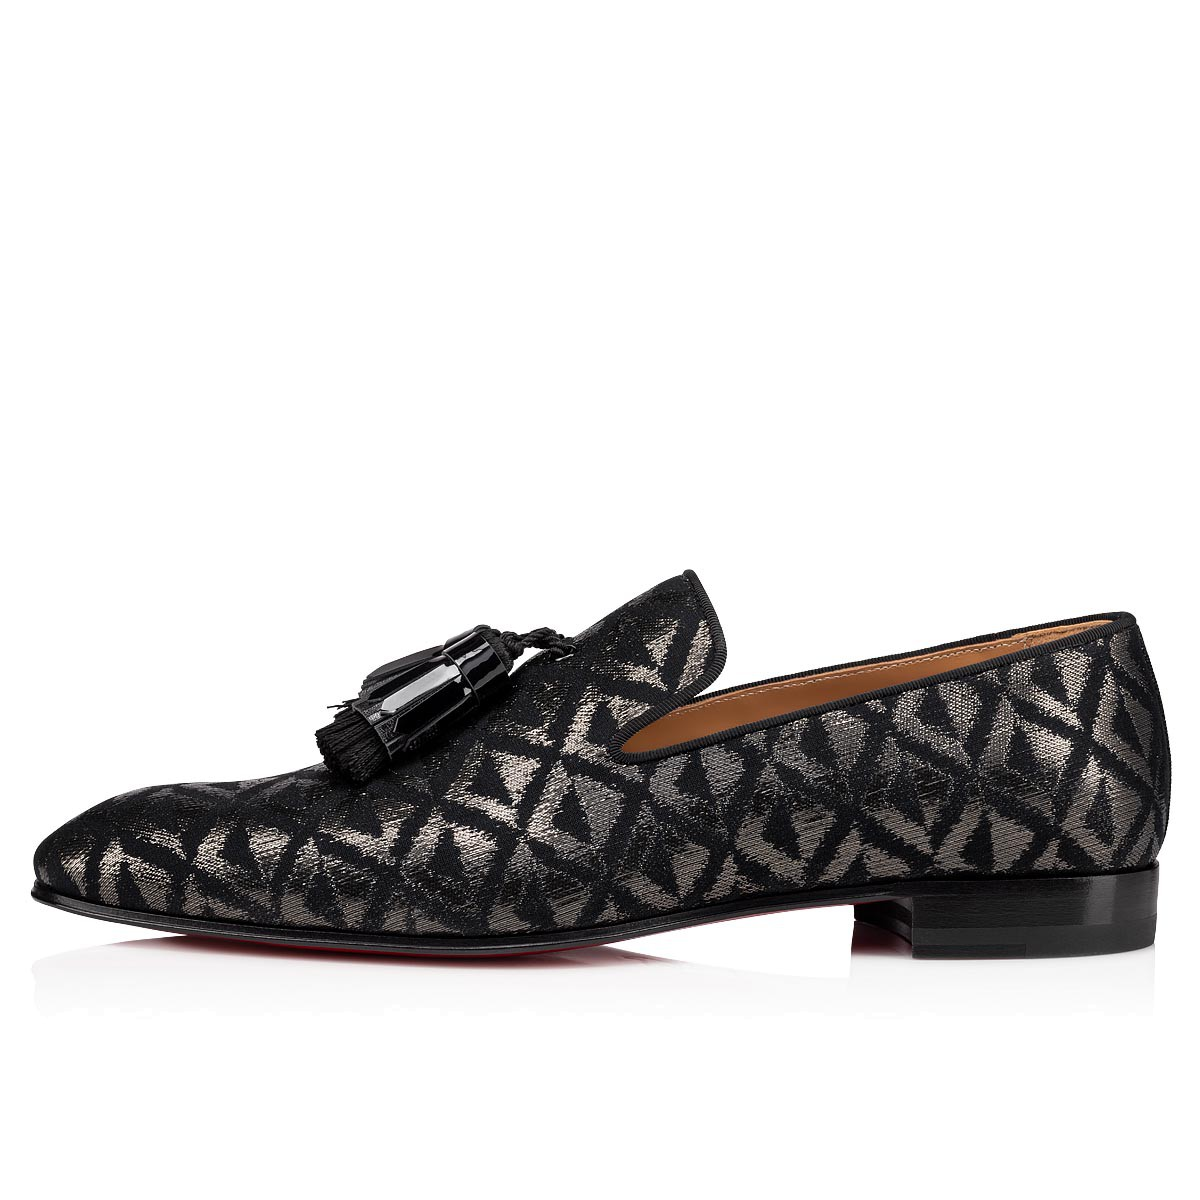 Shoes - Badmilion Flat - Christian Louboutin